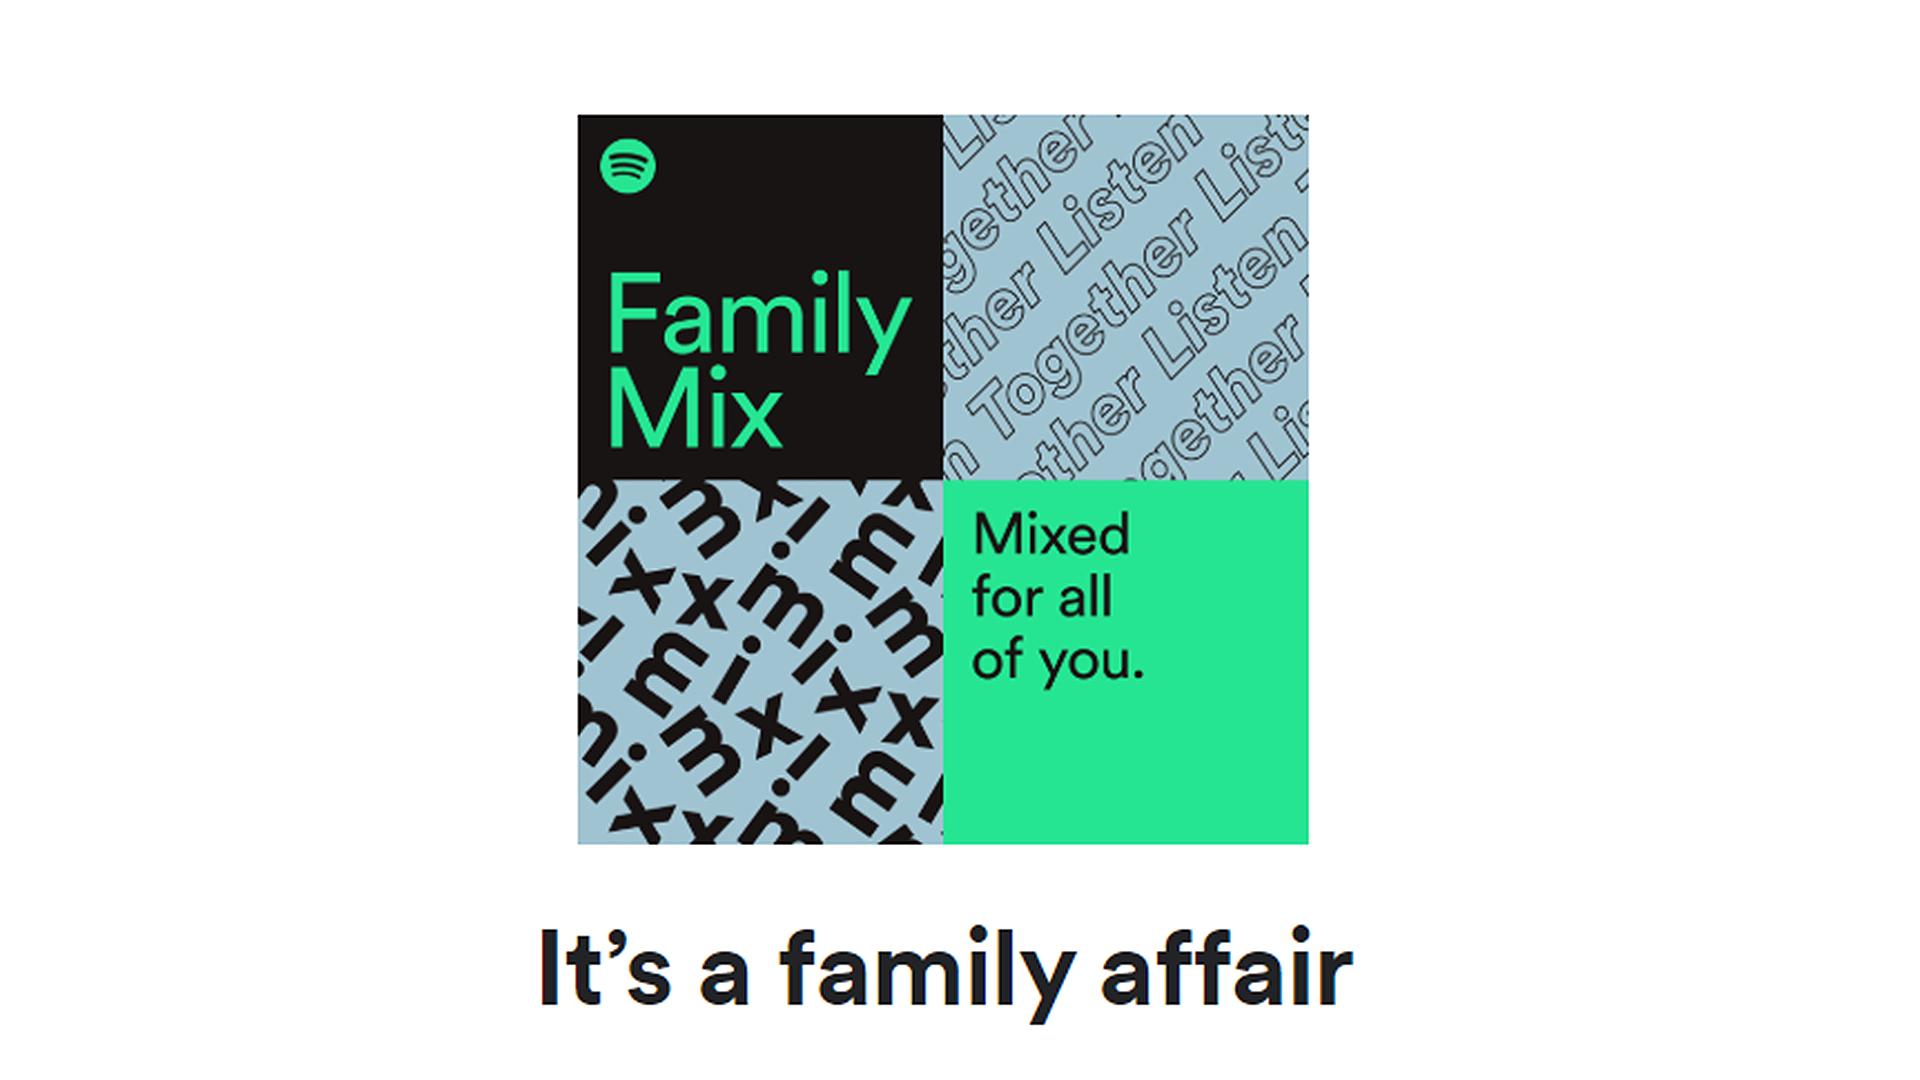 An illustration of a Spotify Family Playlist.